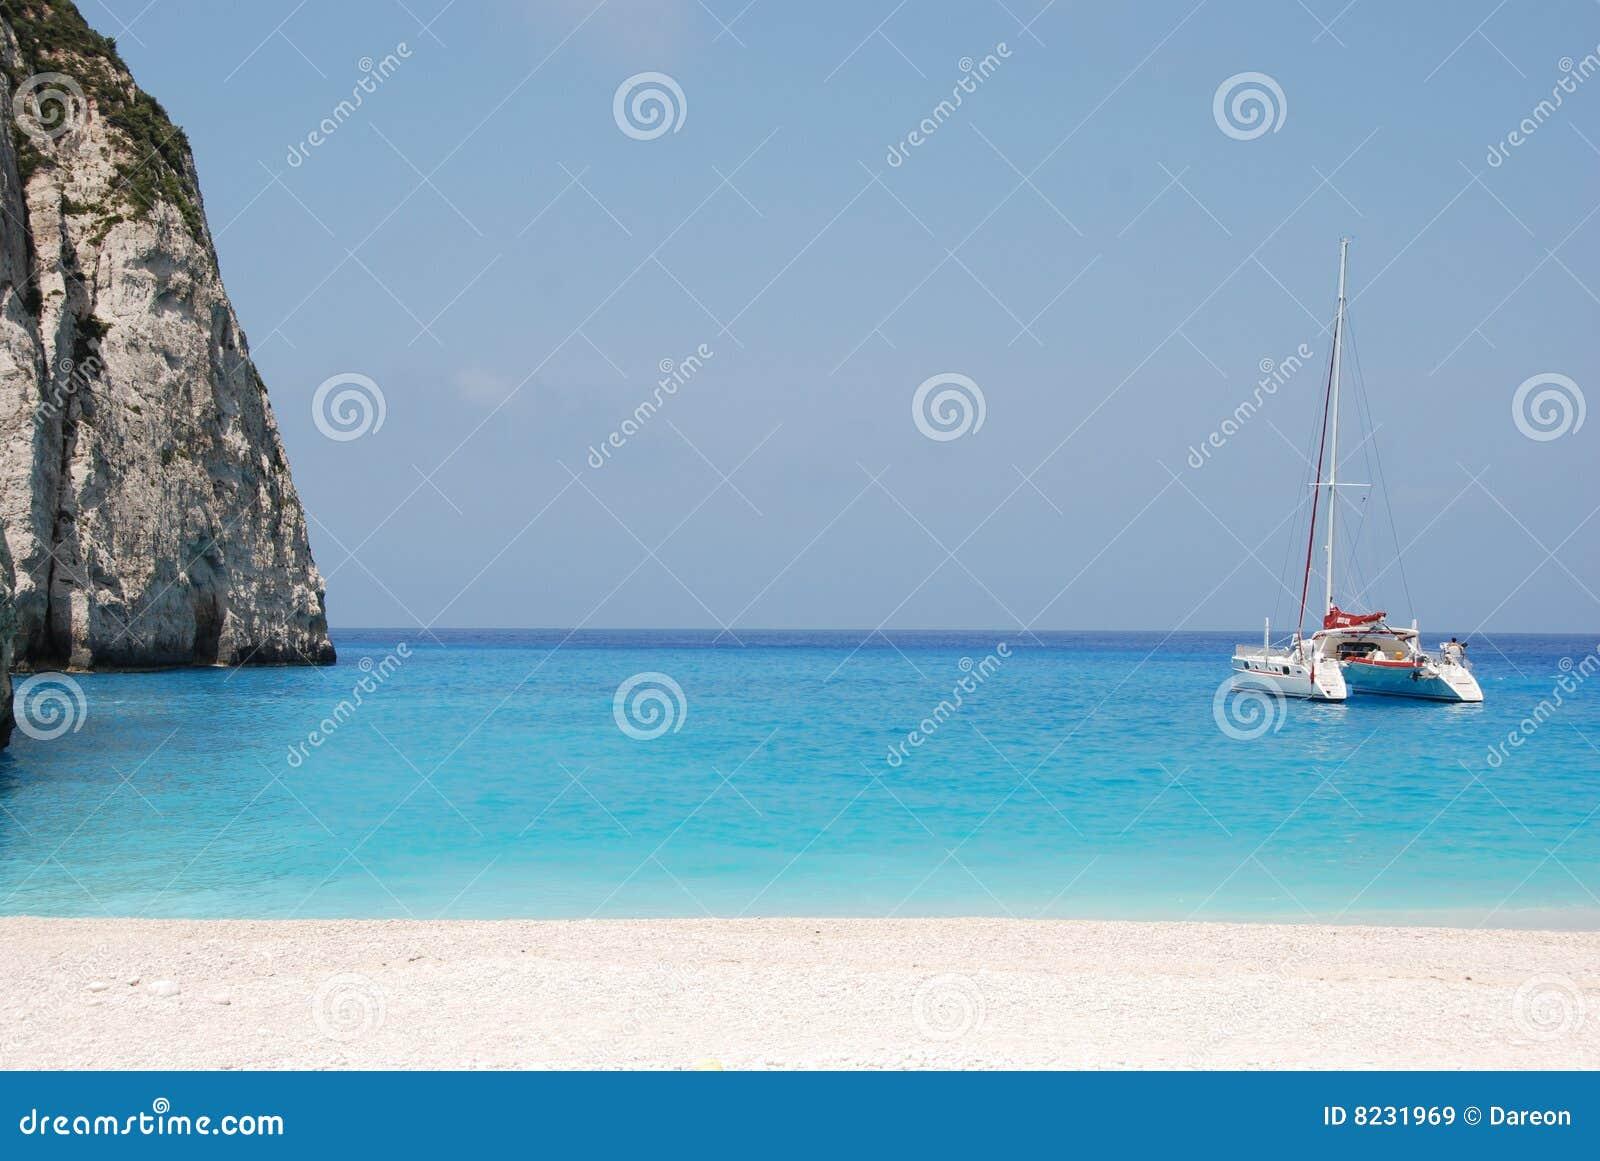 Navagio - Zakynthos island blue sea beach greece